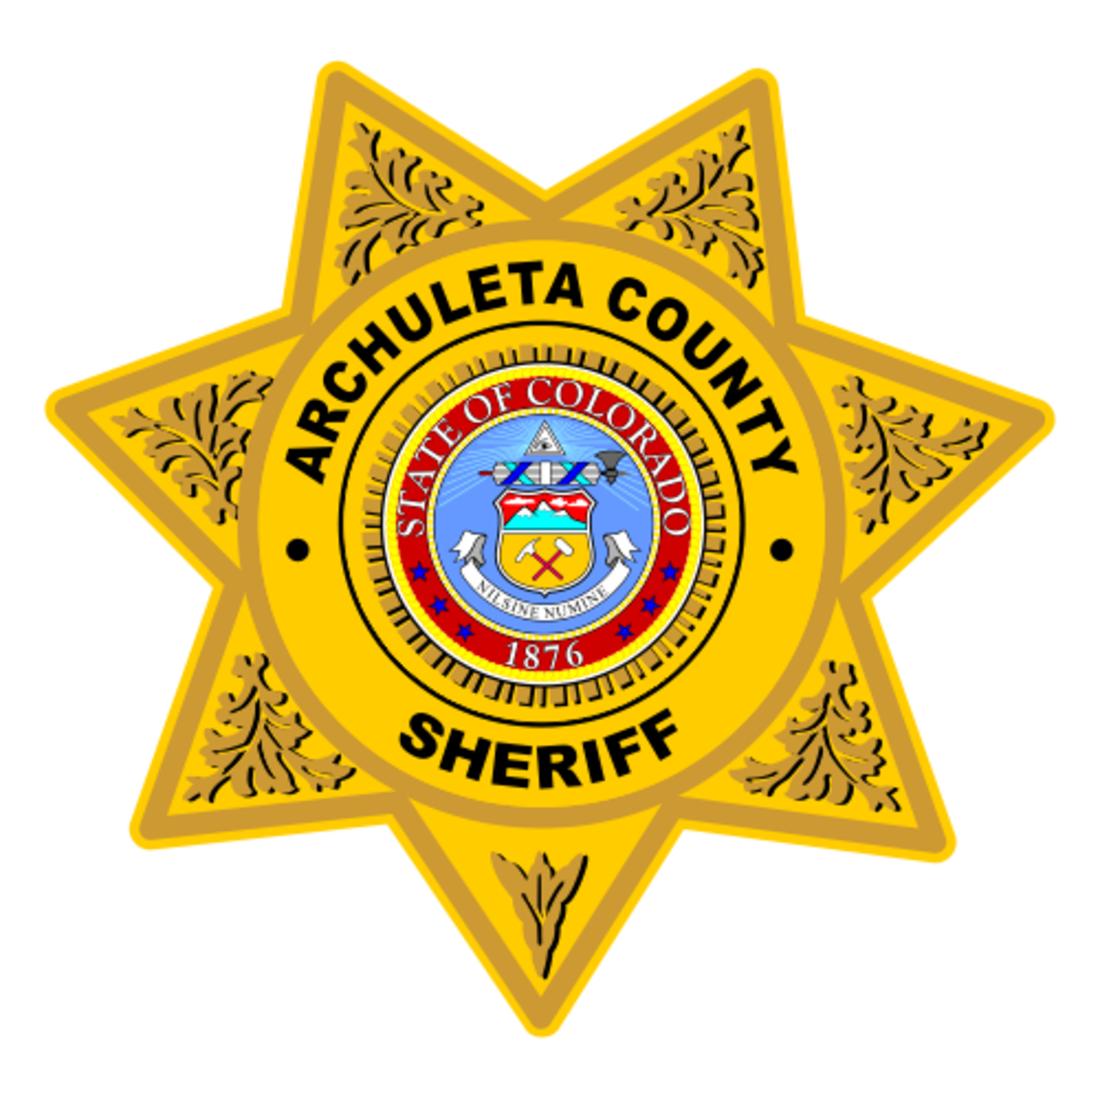 Custom Sheriff Police 7 Point Badge Decal - Teamlogo.com ...